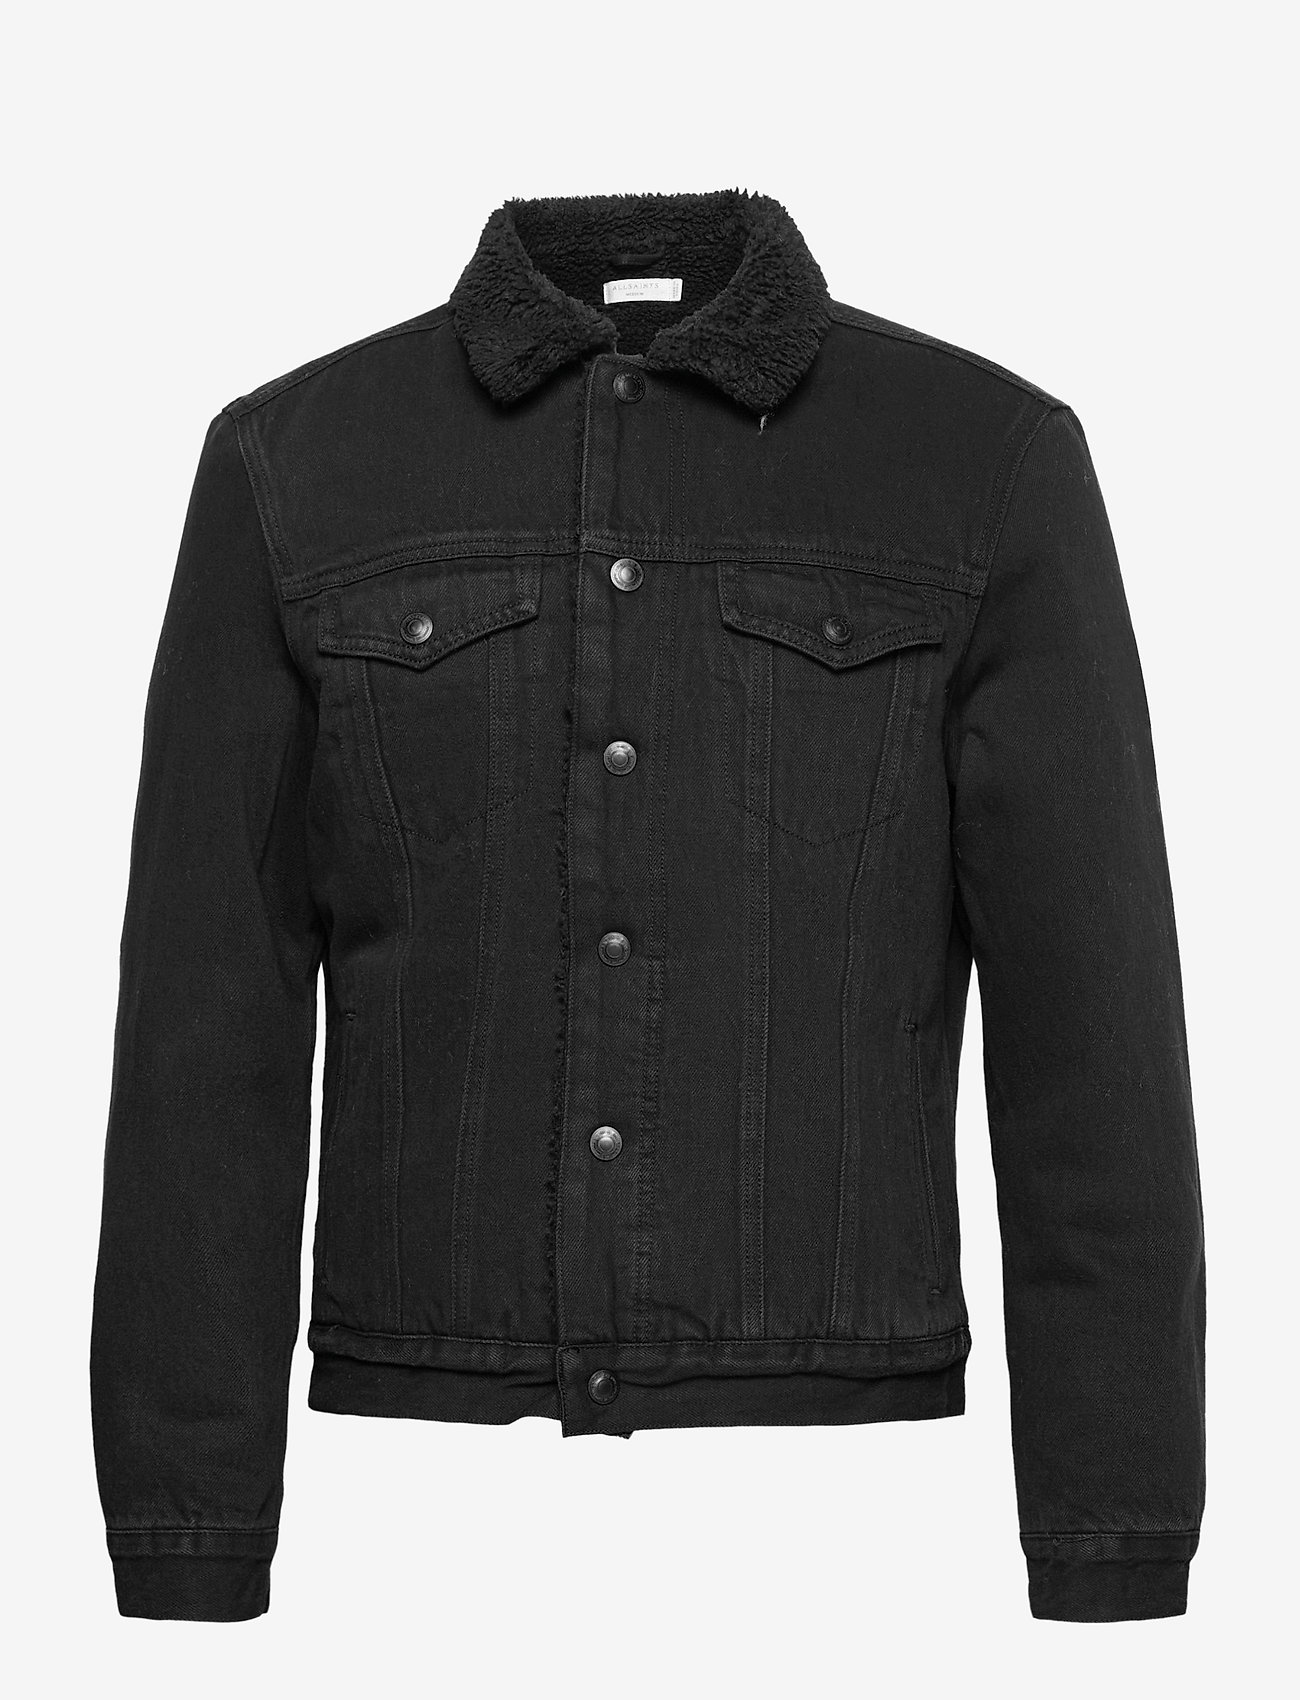 AllSaints - ALDER JACKET - vestes en jean - black - 0